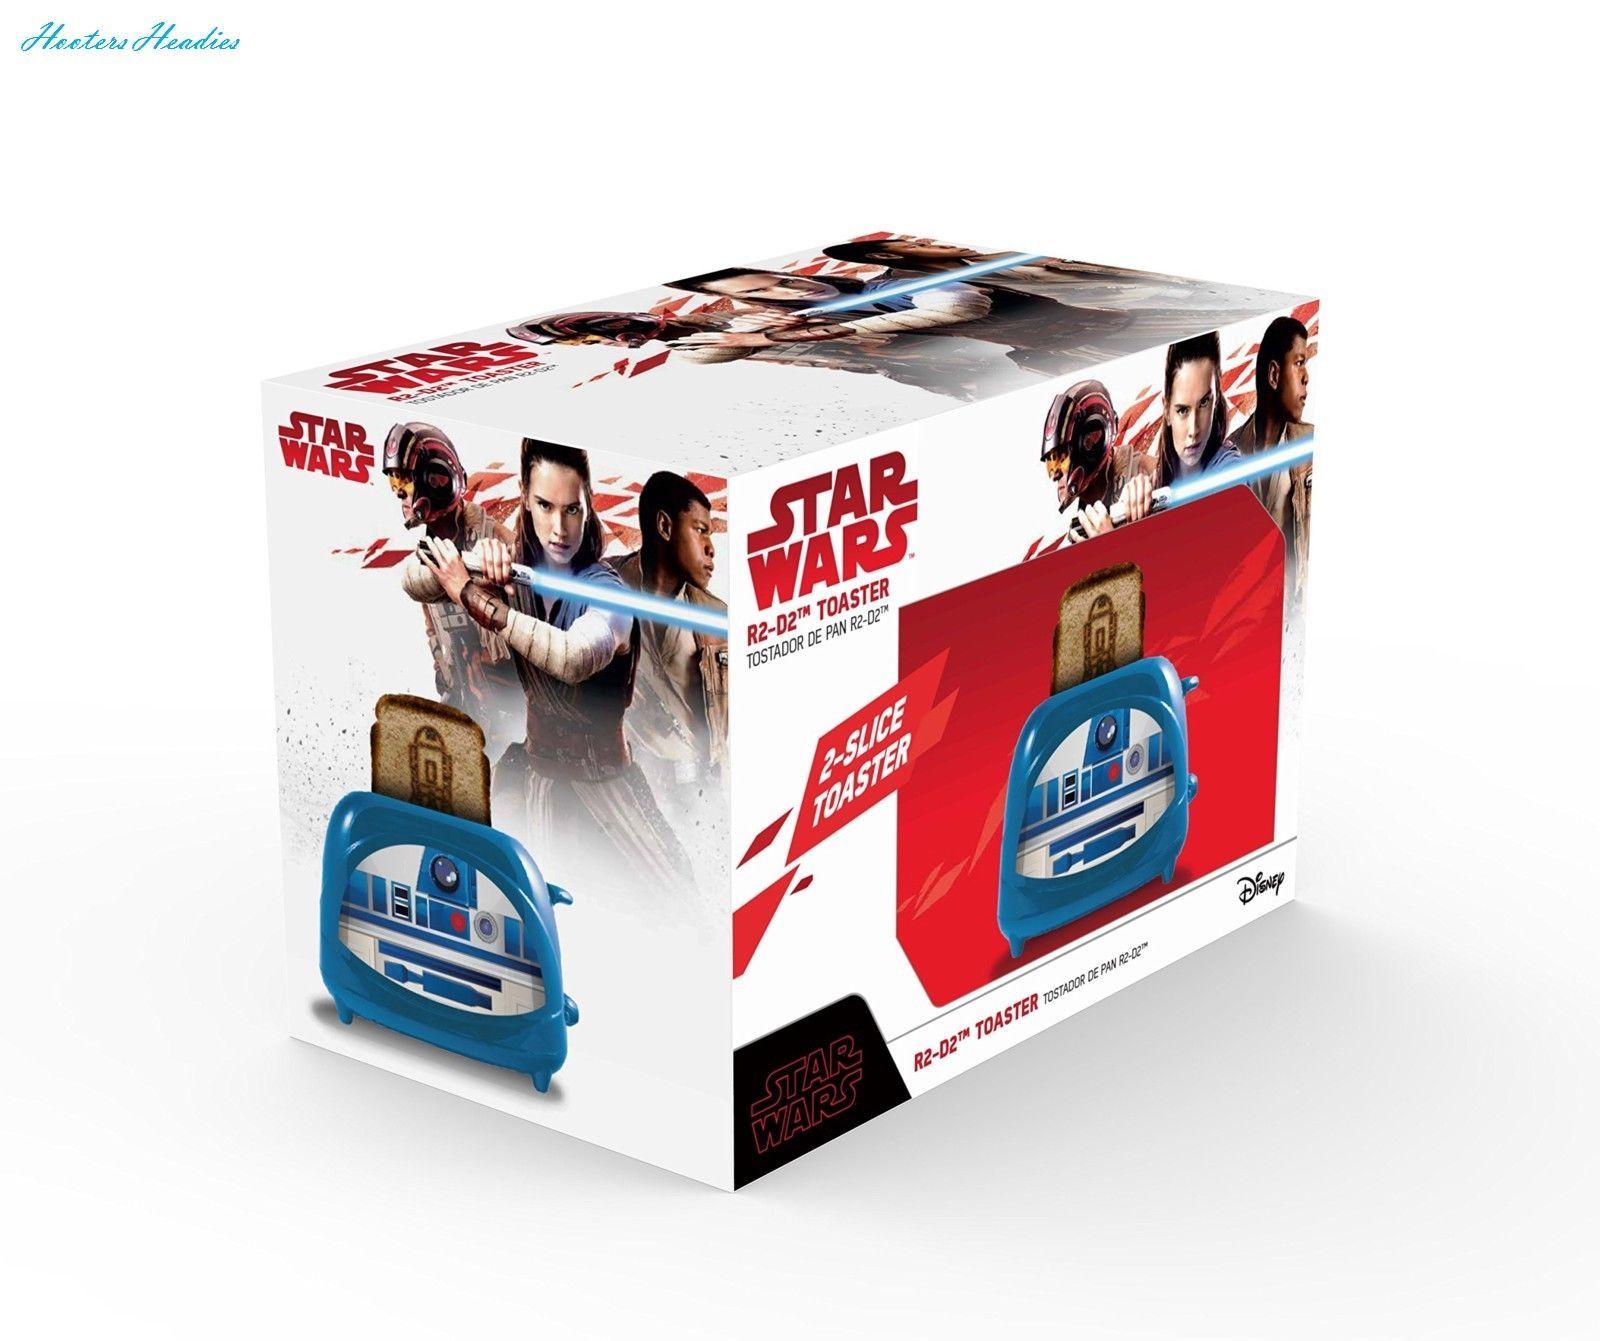 Star Wars R2D2 Empire Toaster